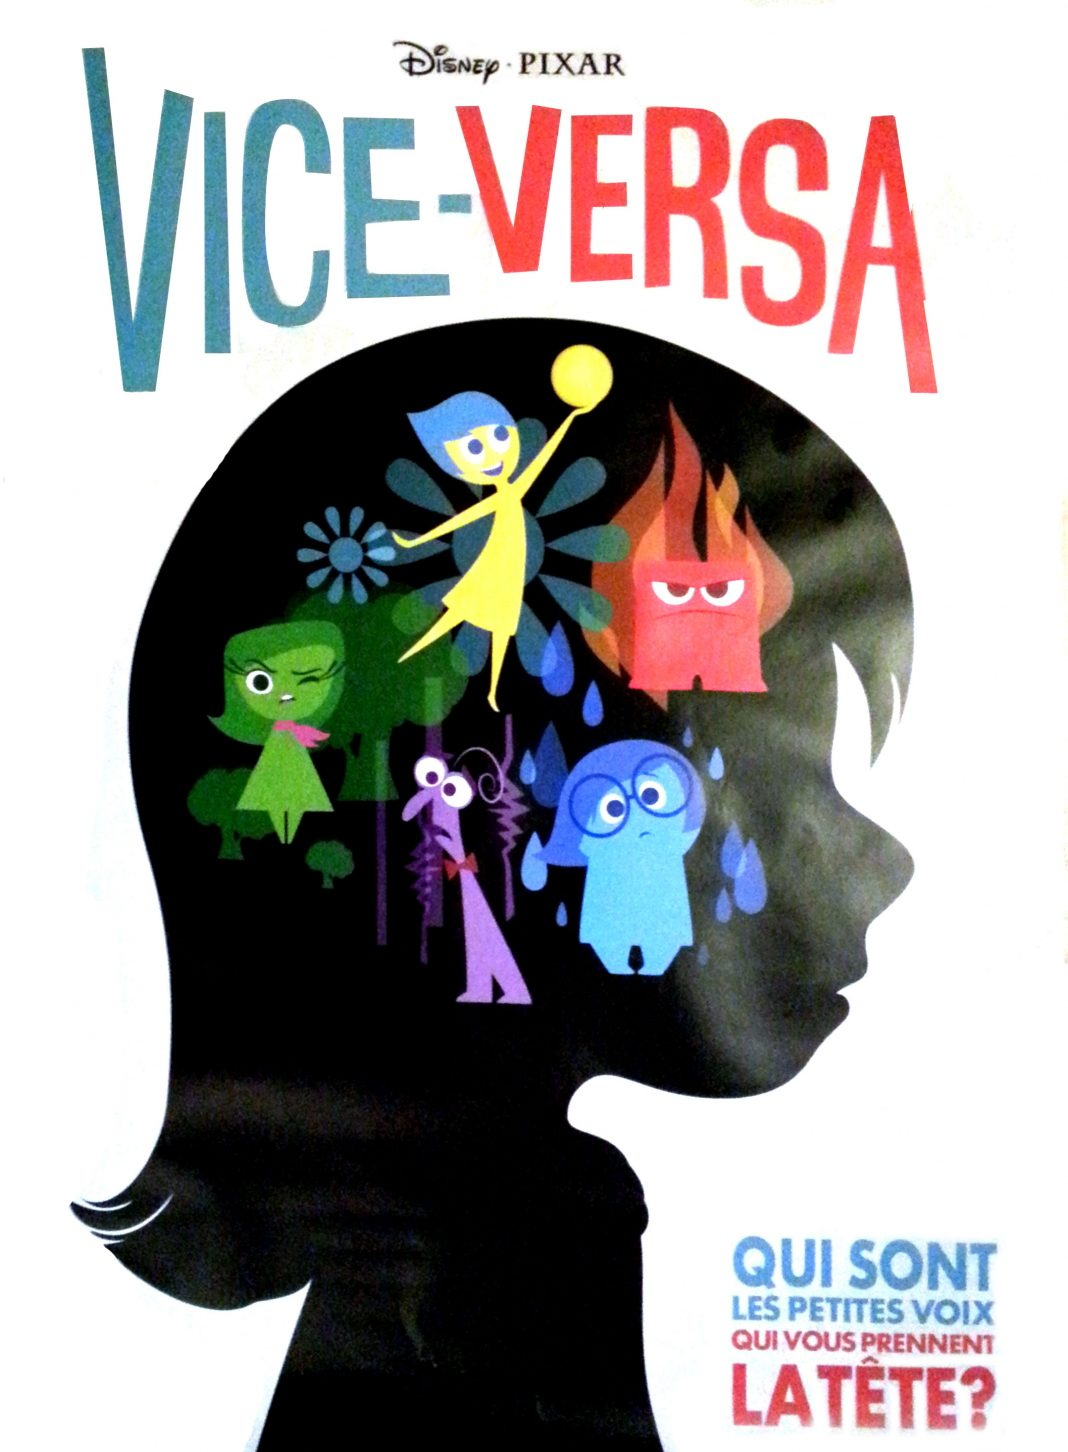 Pixar Disney Affiche Vice Versa